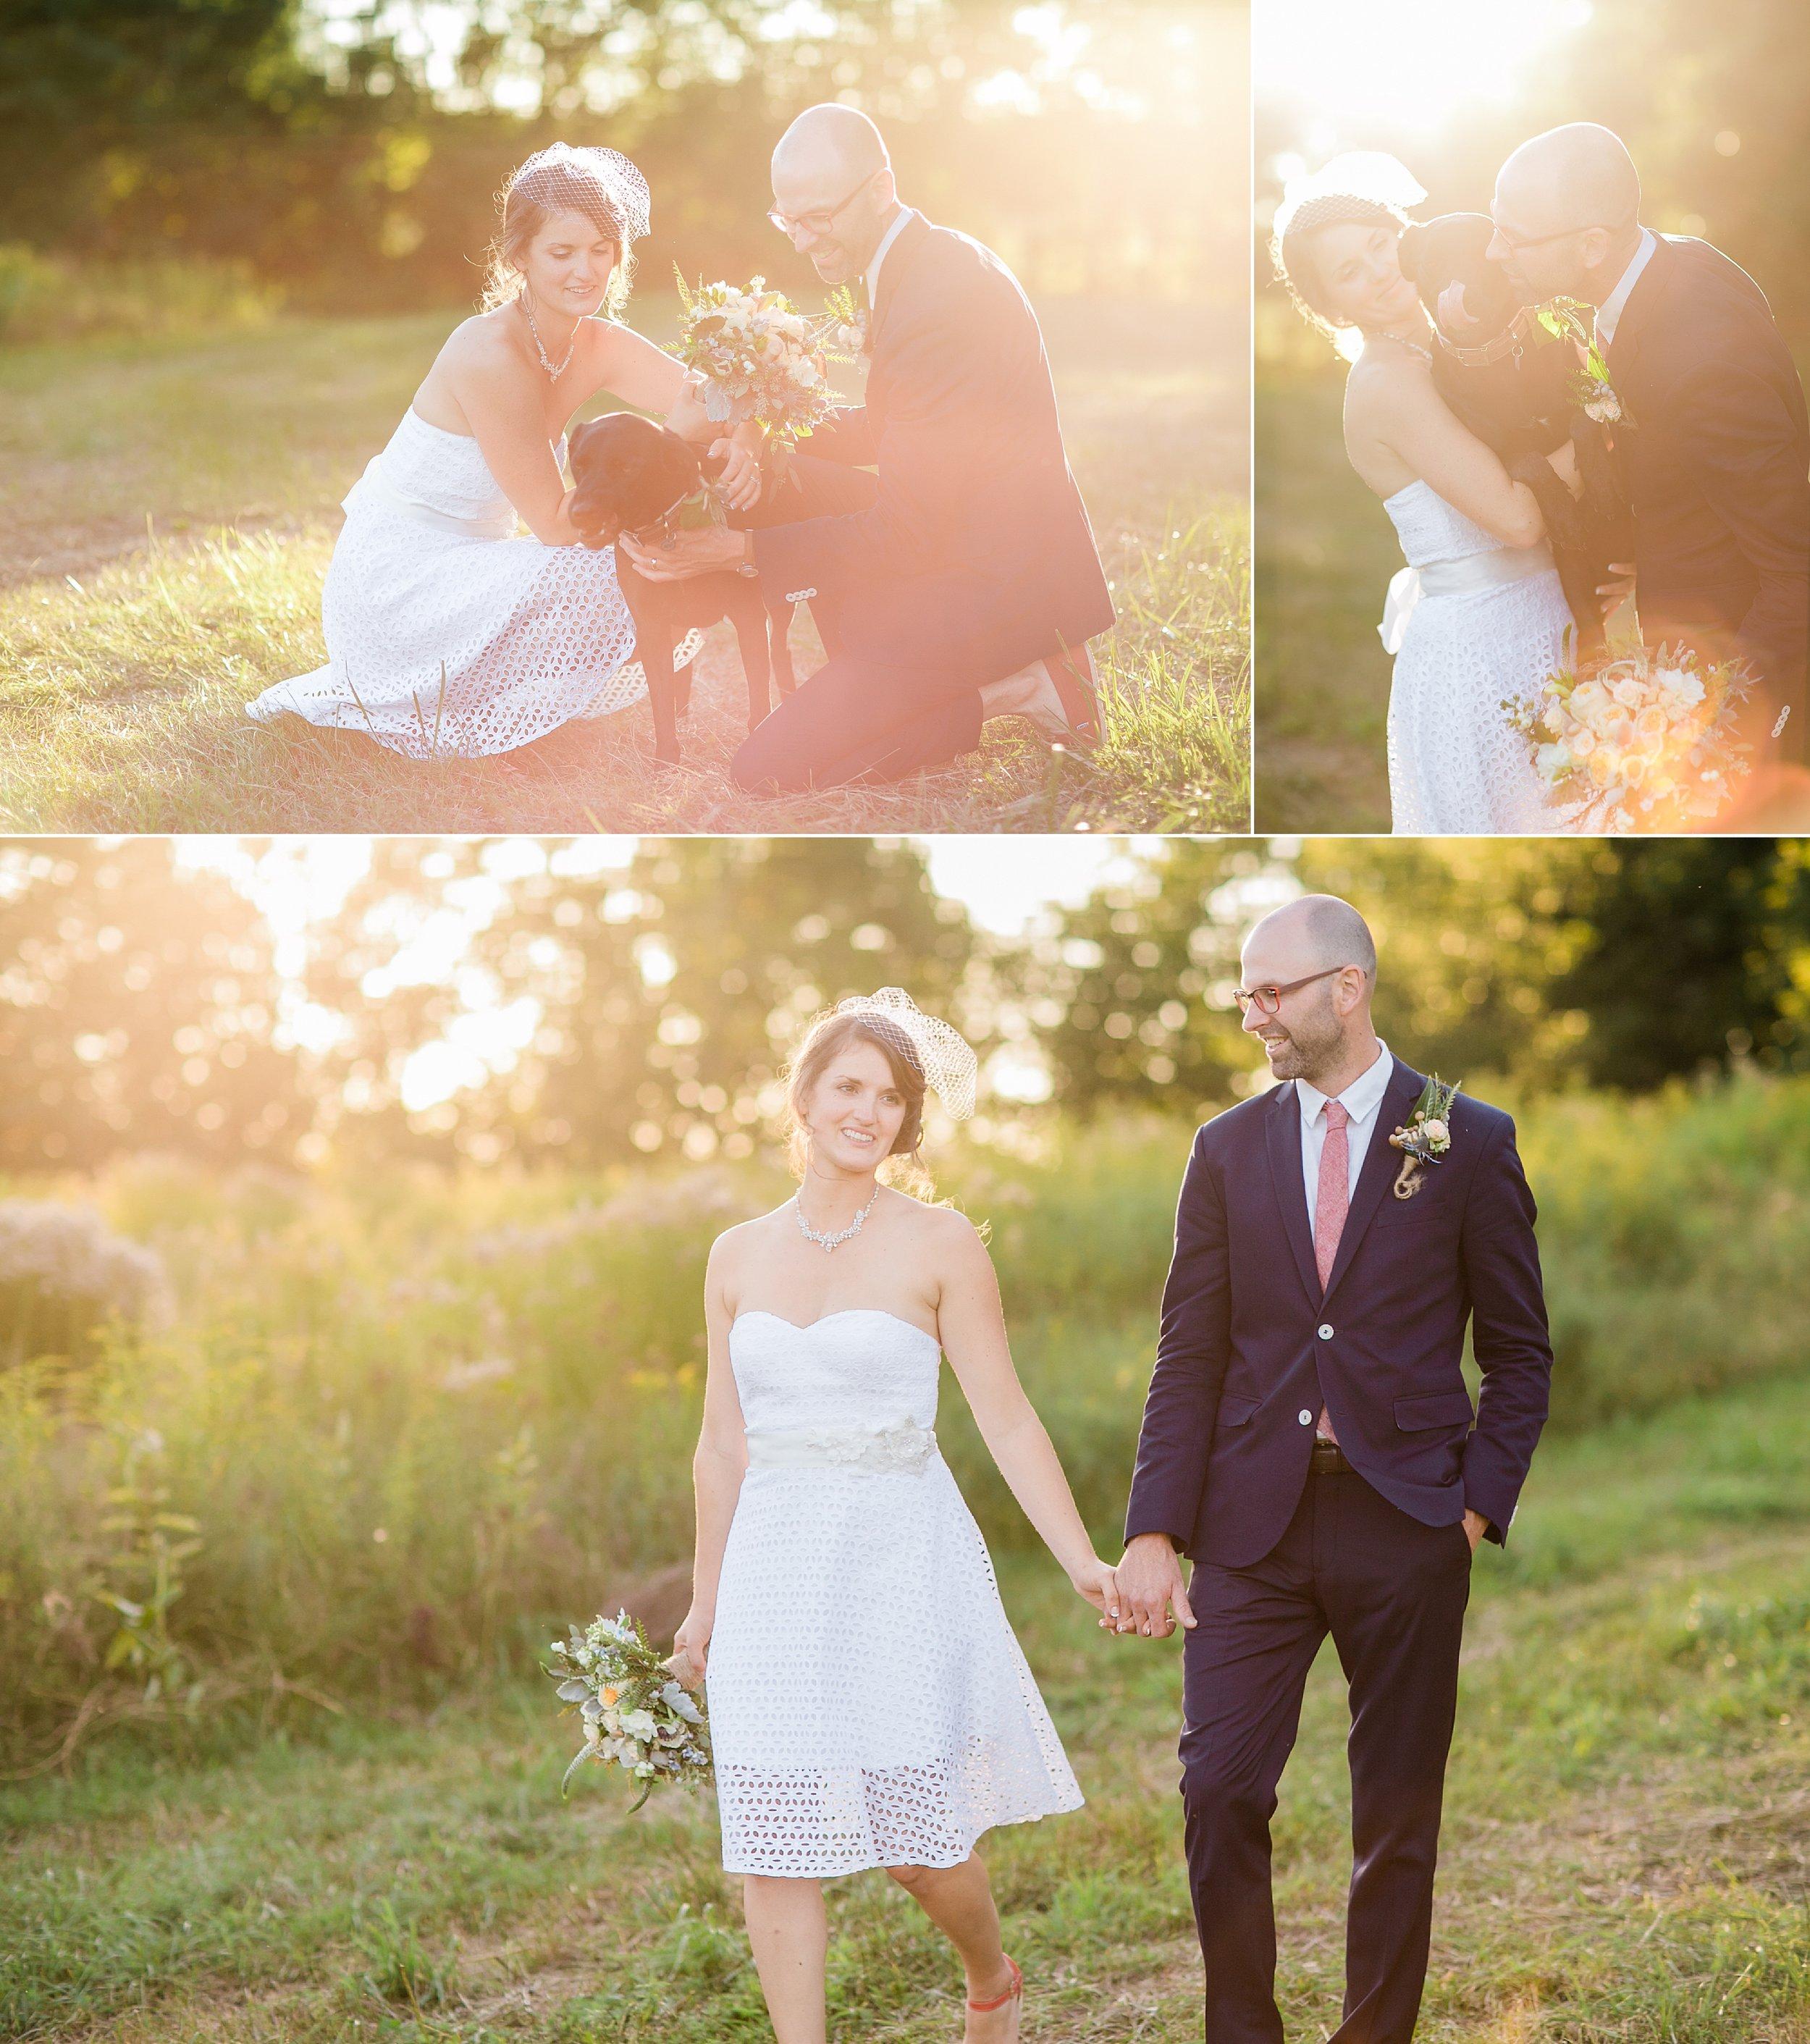 065 los angeles wedding photographer.jpg